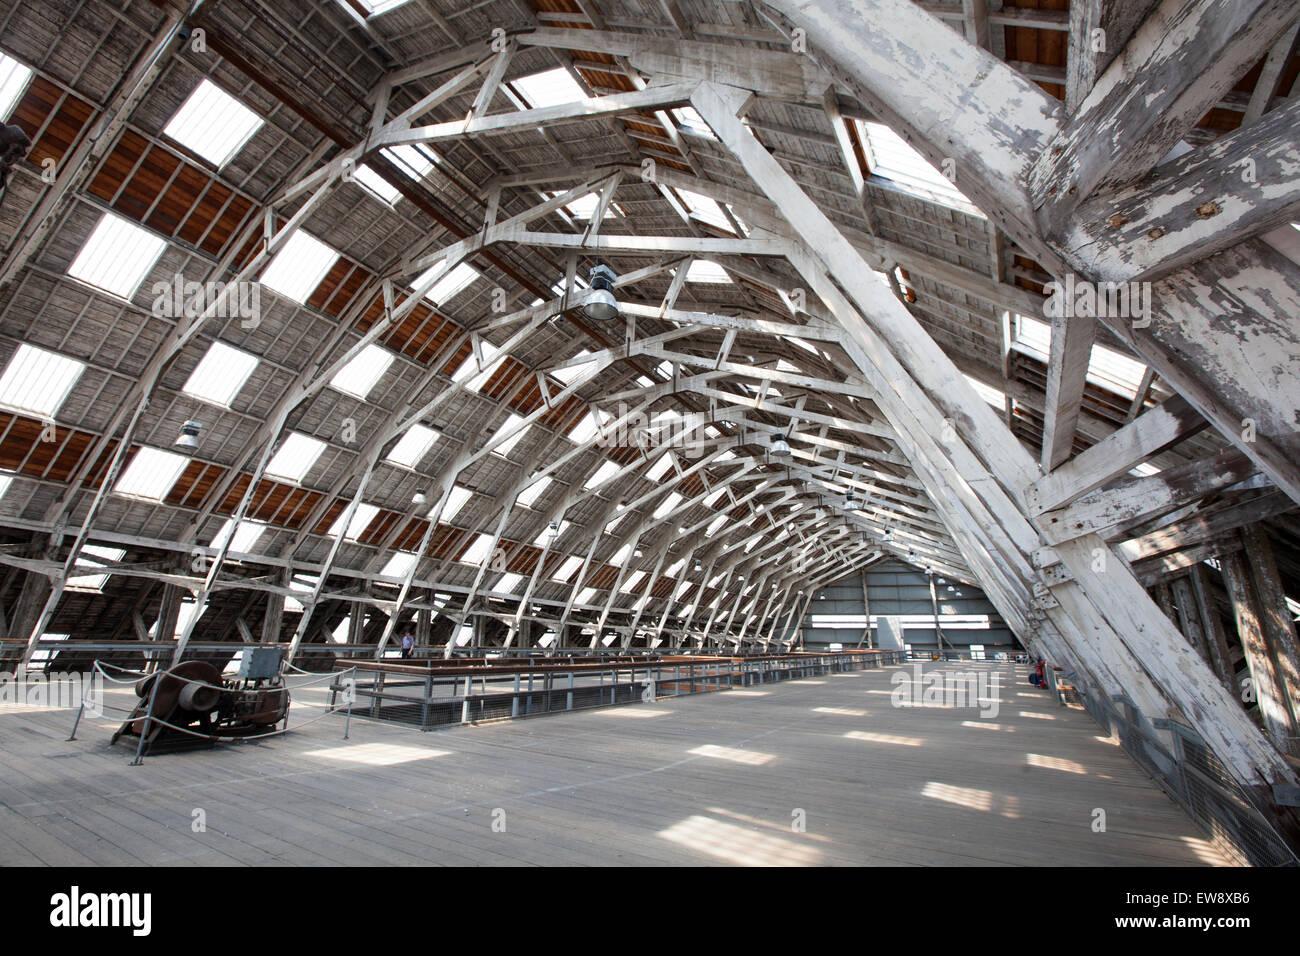 The big space Chatham historic dockyard - Stock Image